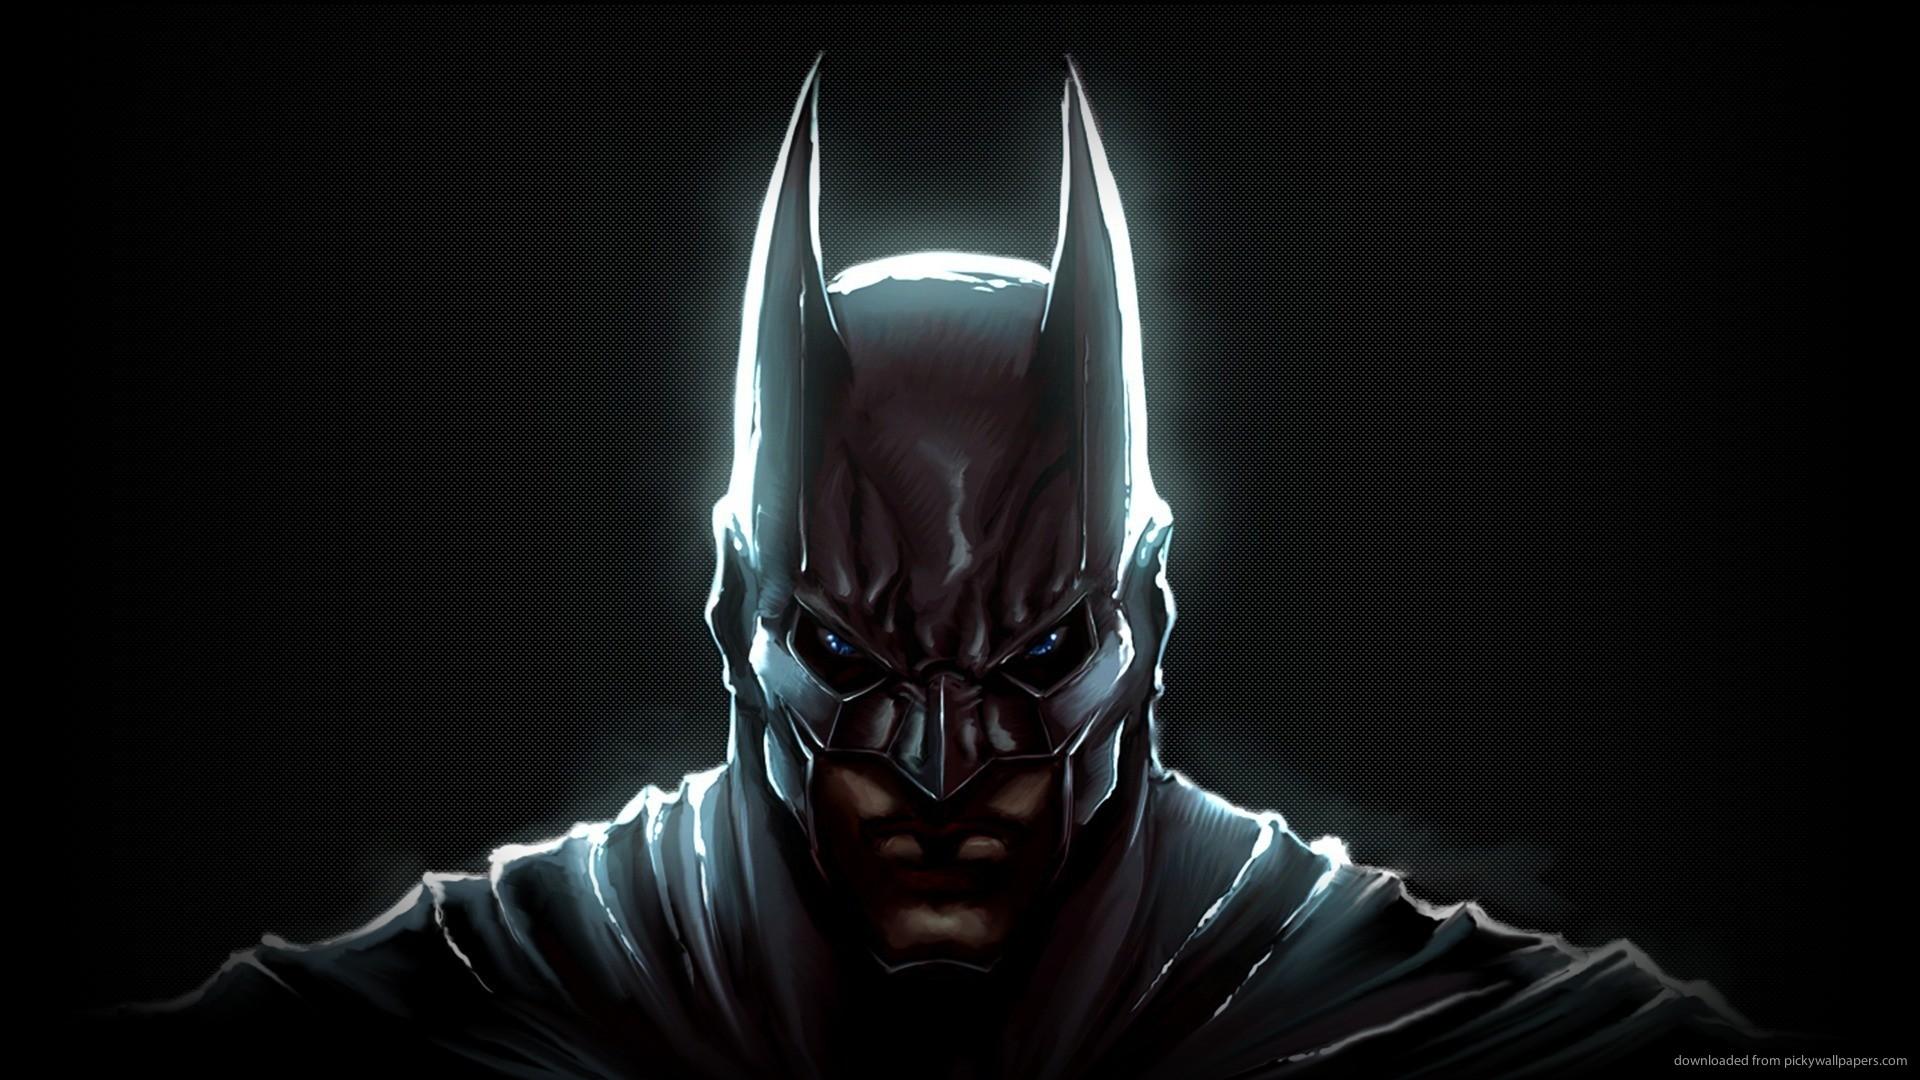 2827 <b>Batman HD Wallpapers</b> | <b>Backgrounds</b> - <b>Wallpaper</b> Abyss